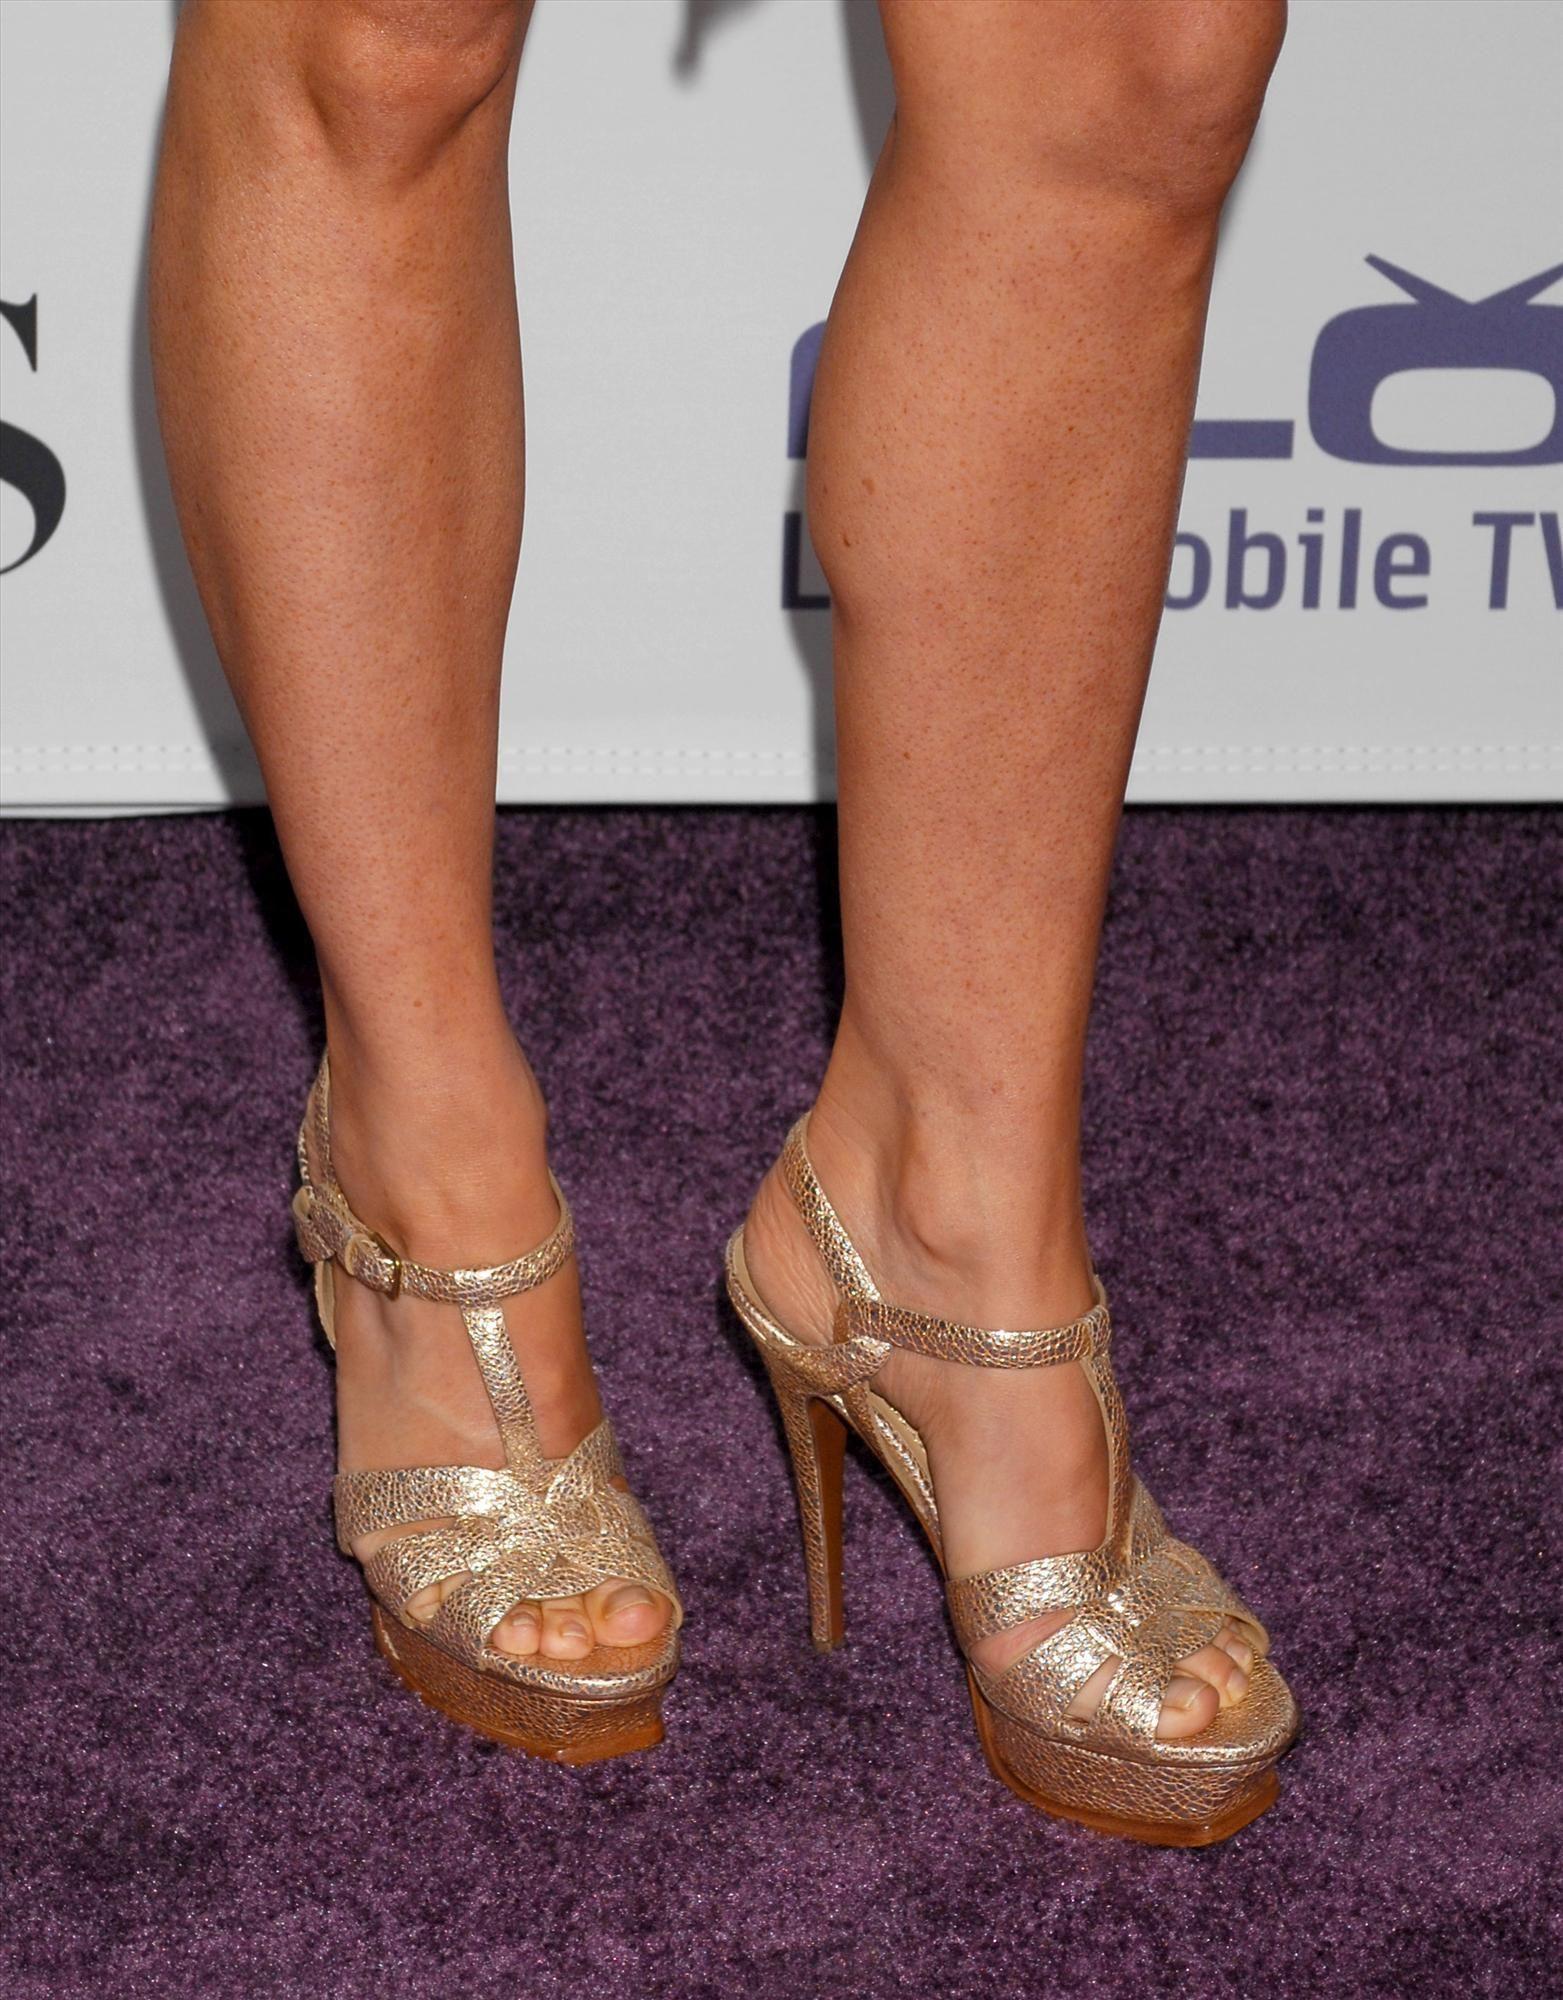 Town shoes, Celebrity feet, Heels